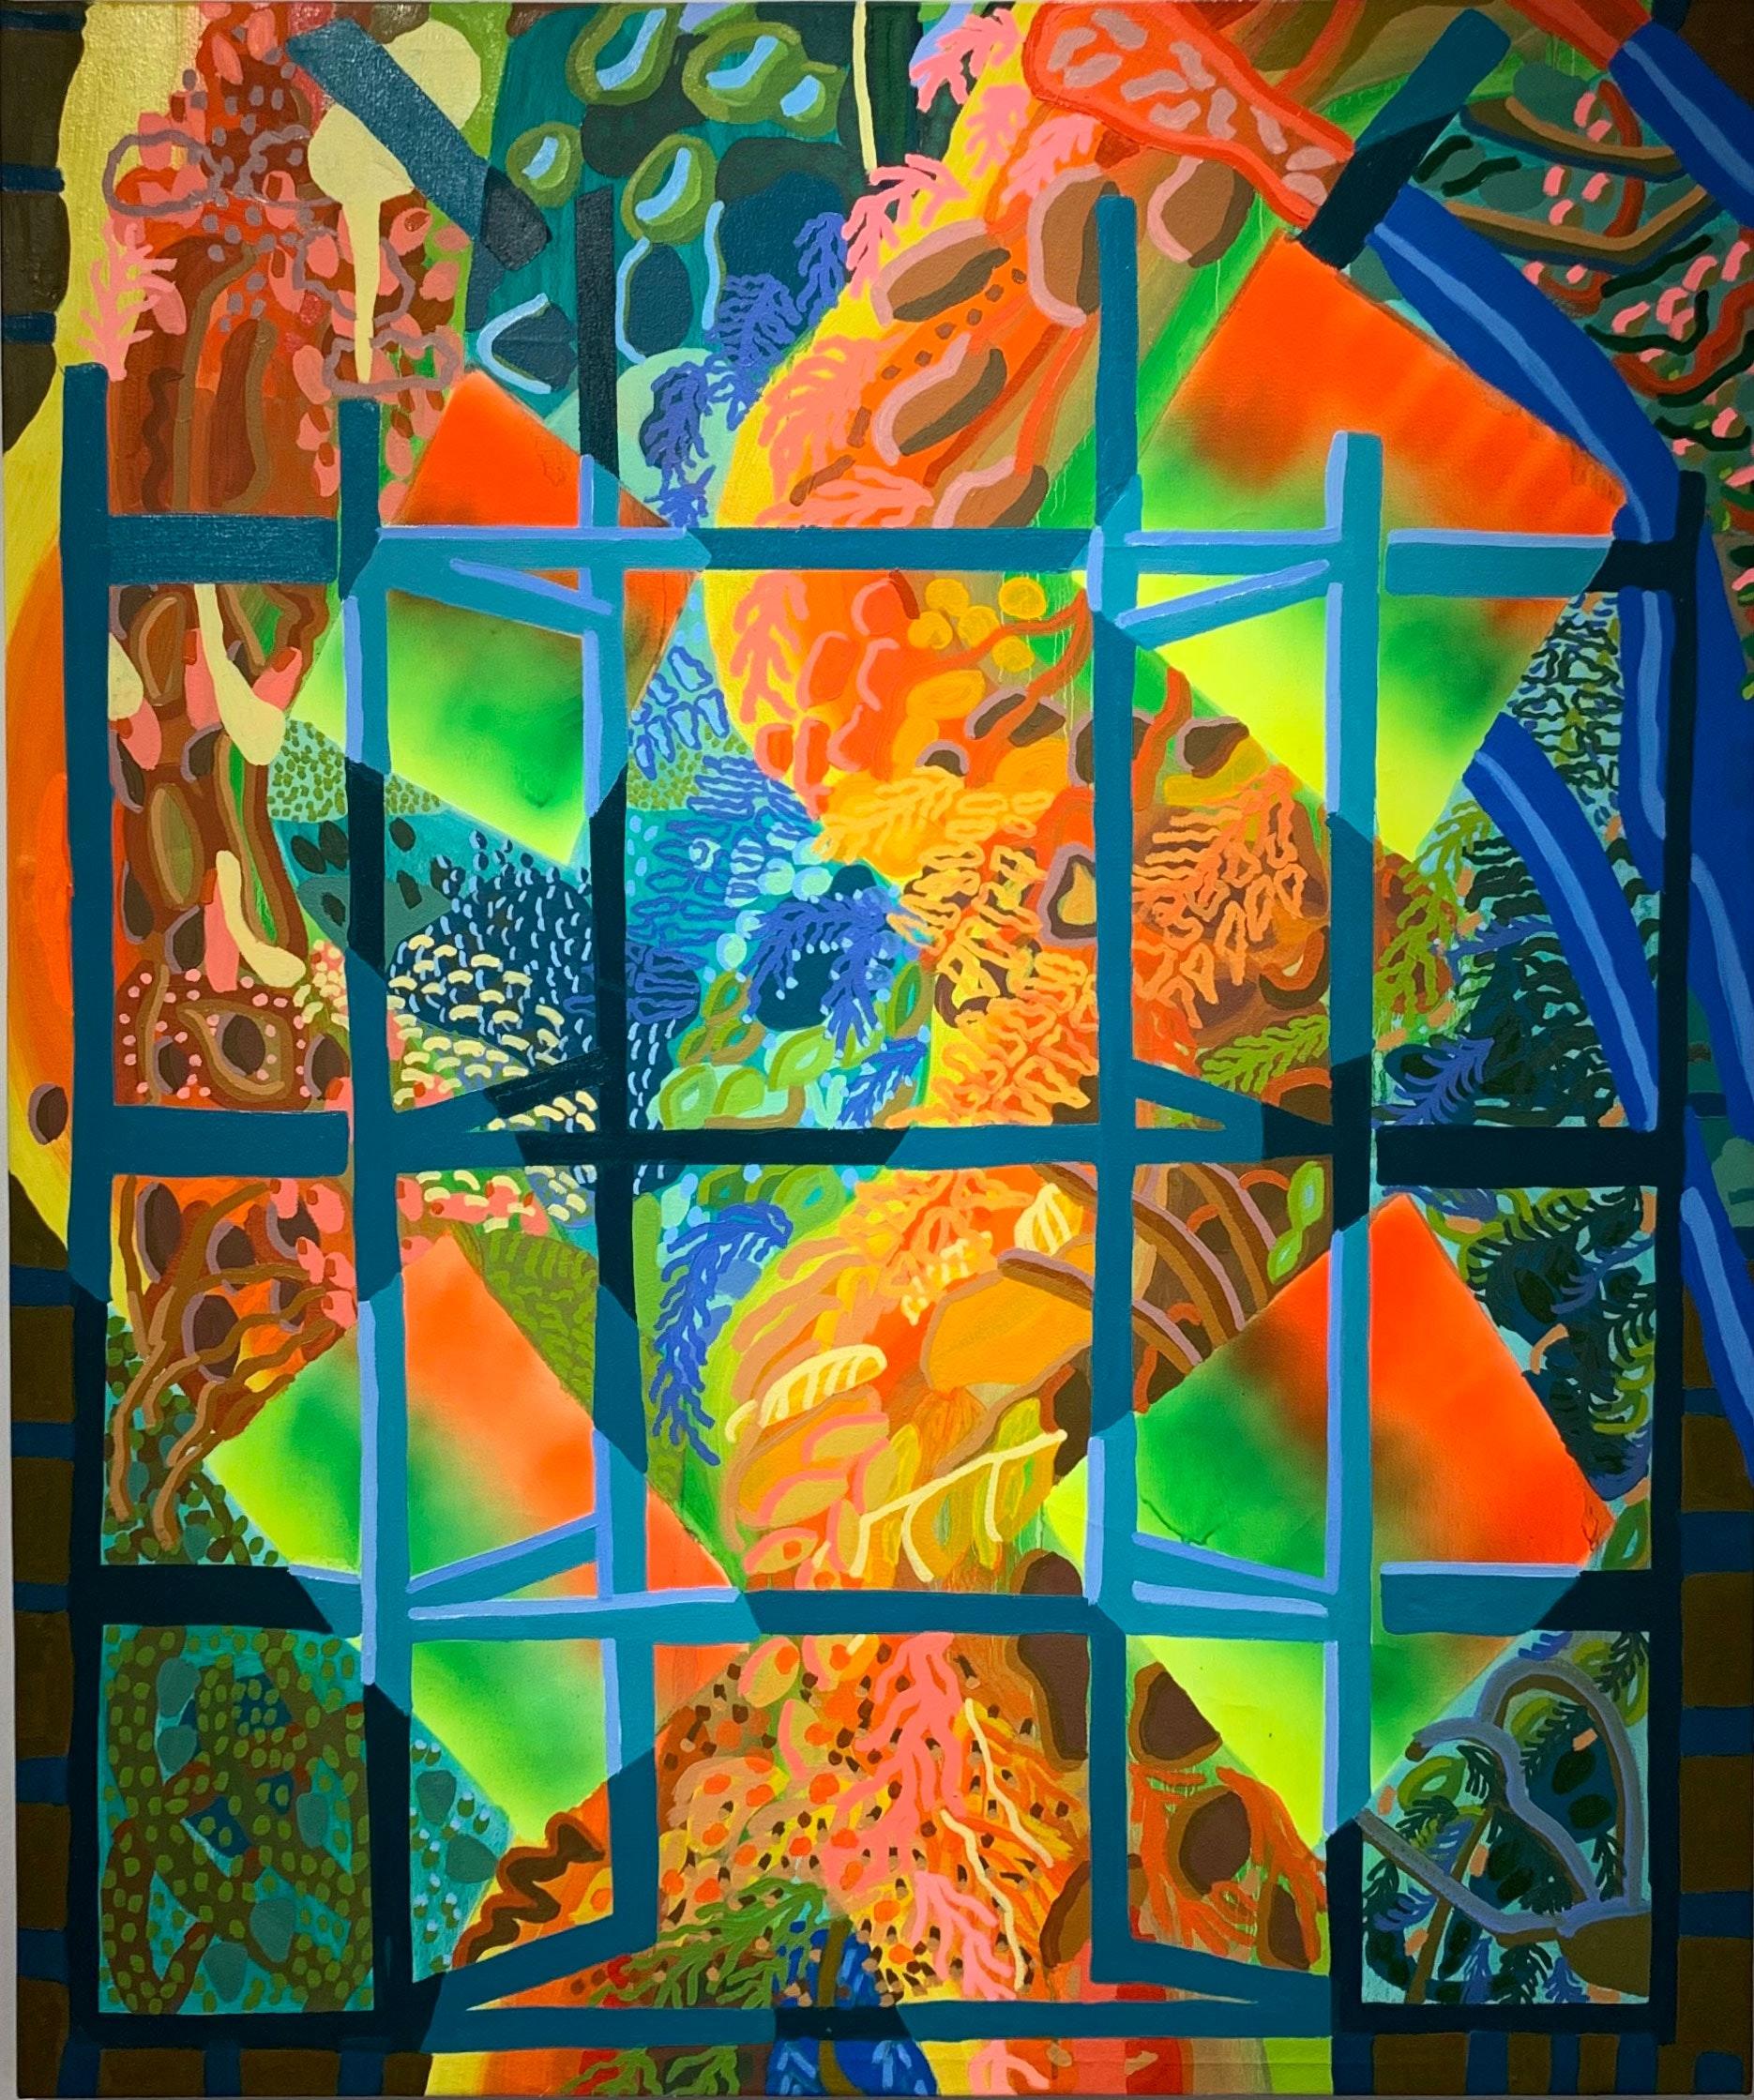 Estefania Velez Rodriguez, <em>Acumulando Luz</em>, 2021. Oil paint and spray paint on canvas, 53 x 44 1/2 inches. Courtesy Praxis Art.